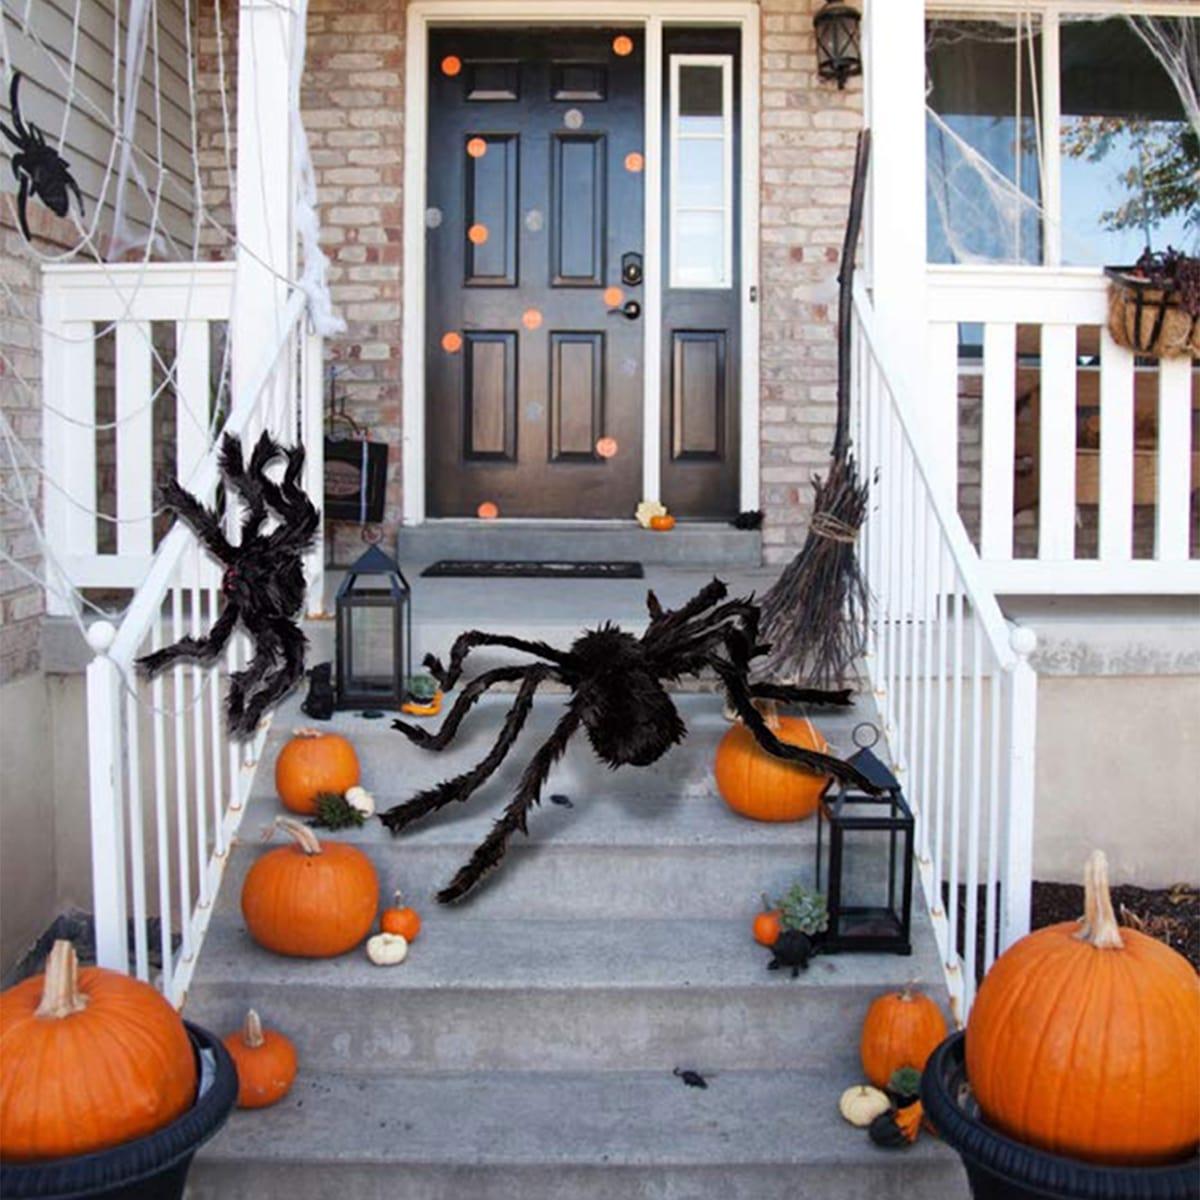 1pc gesimuleerde Spider Halloween-decoratie